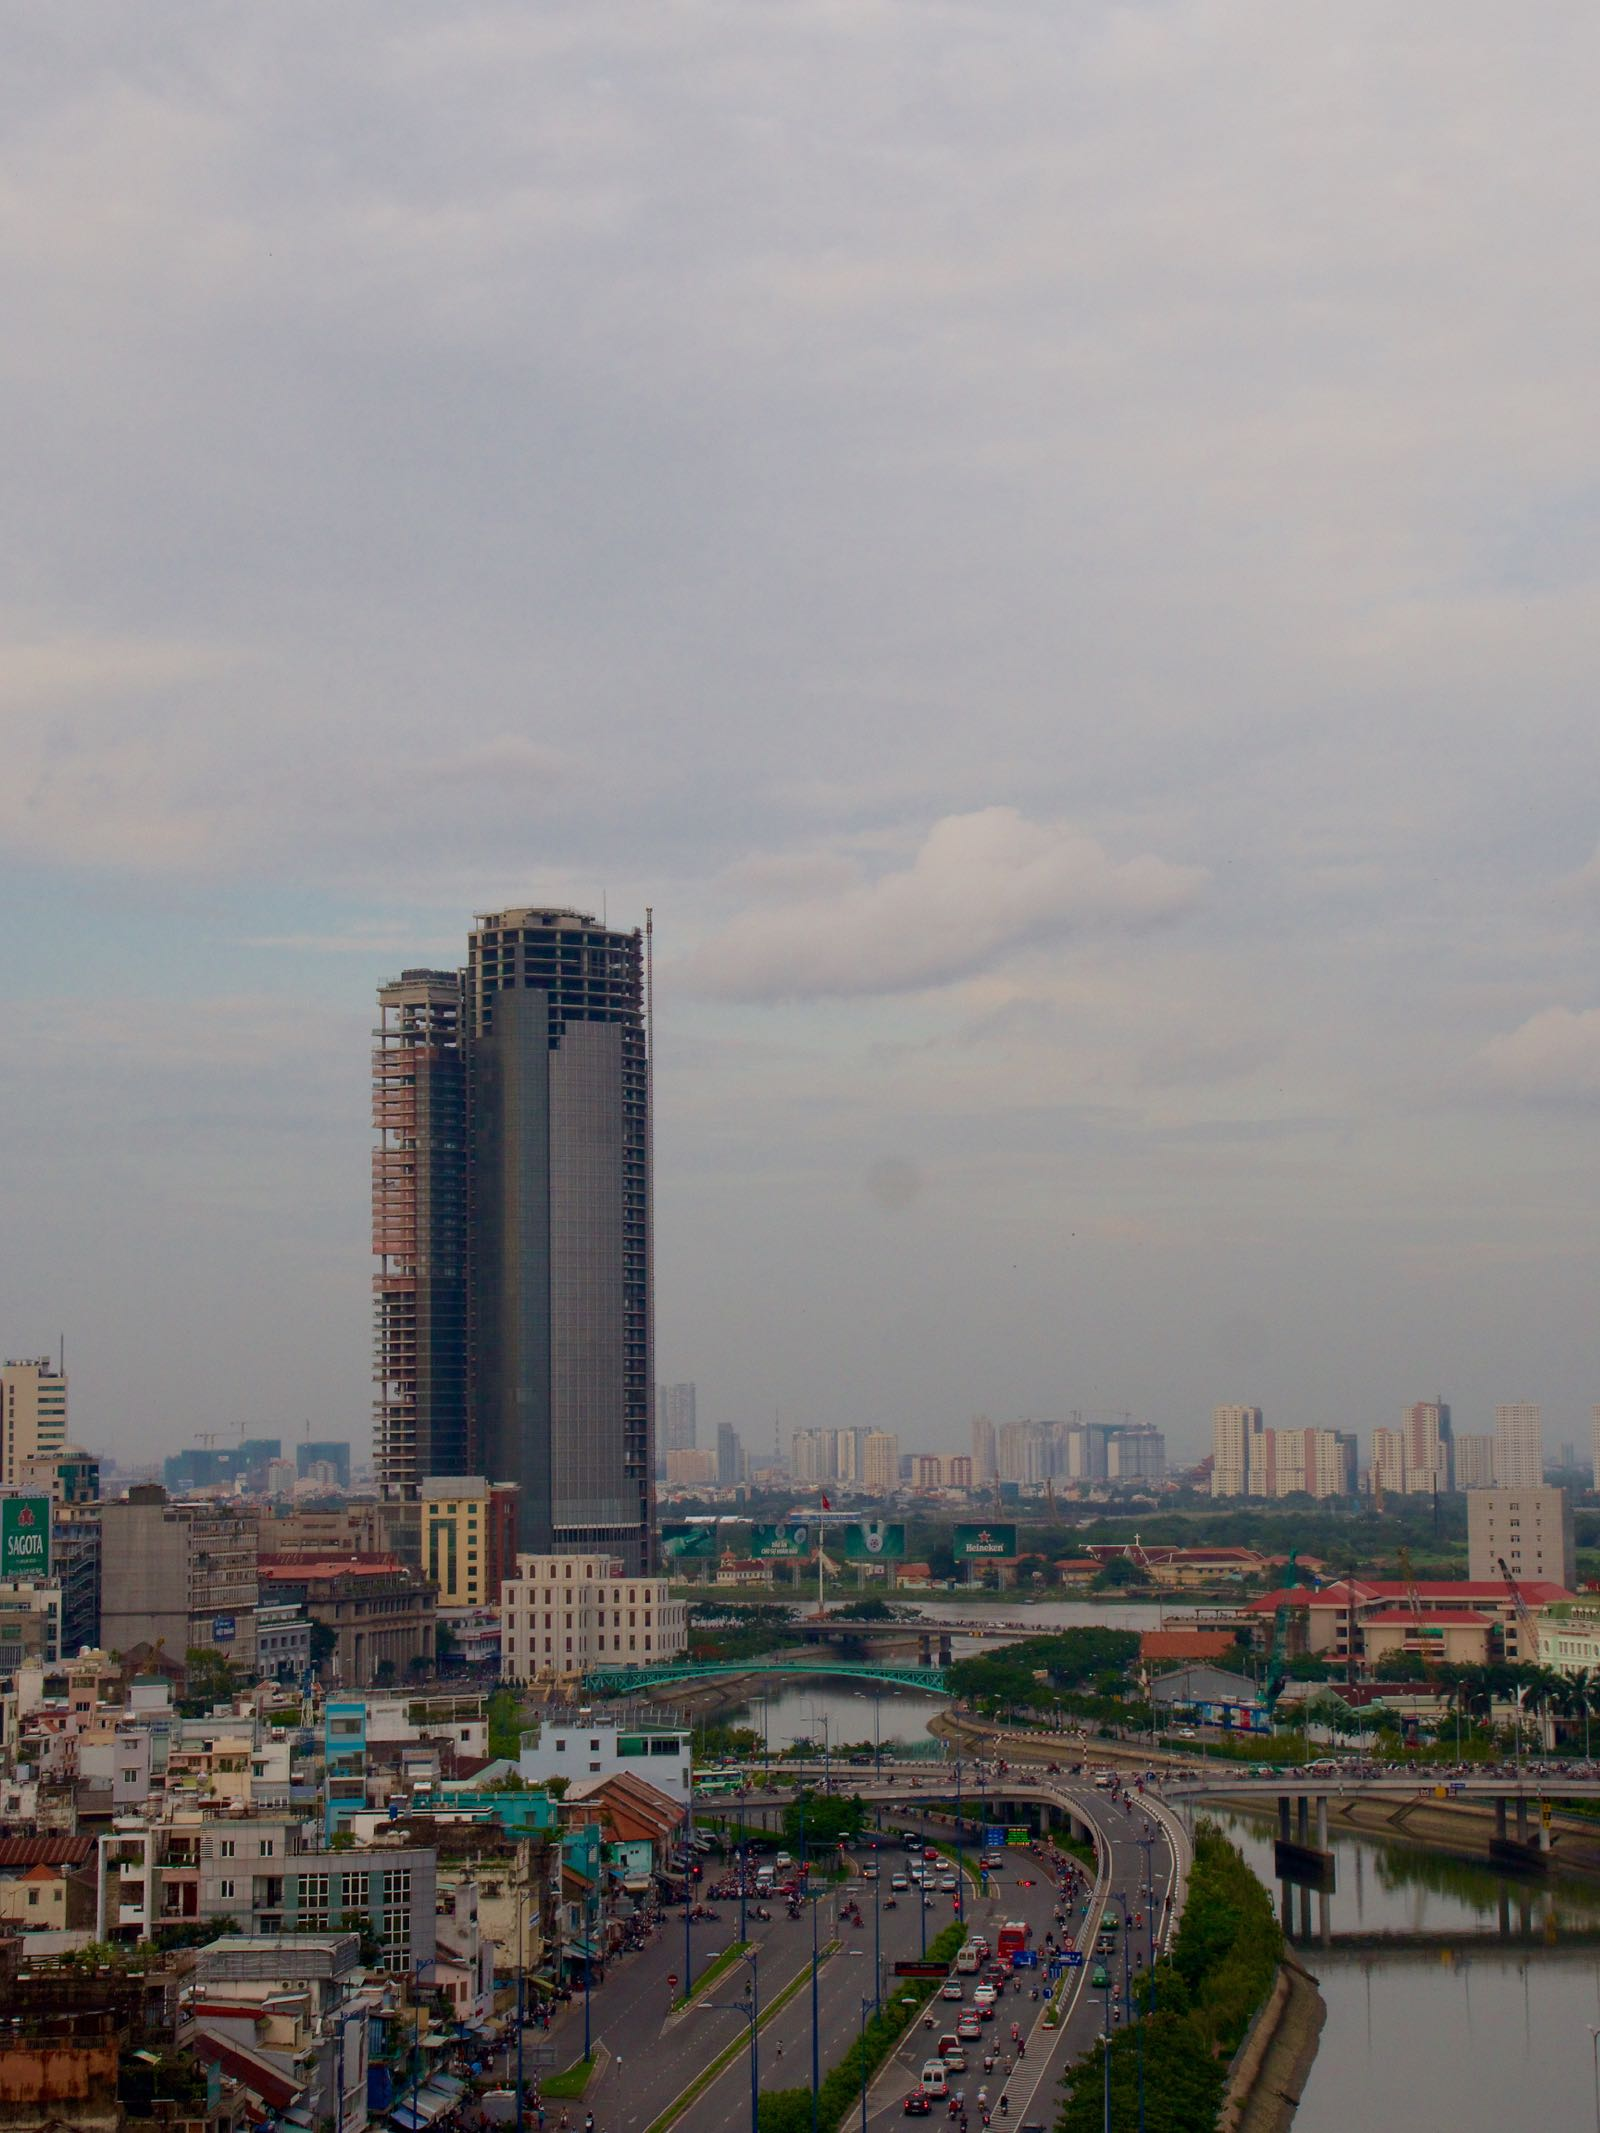 Saigon Skyline - turistbildeversjonen sett fra Sunland ved Saigon River. Foto: Geir